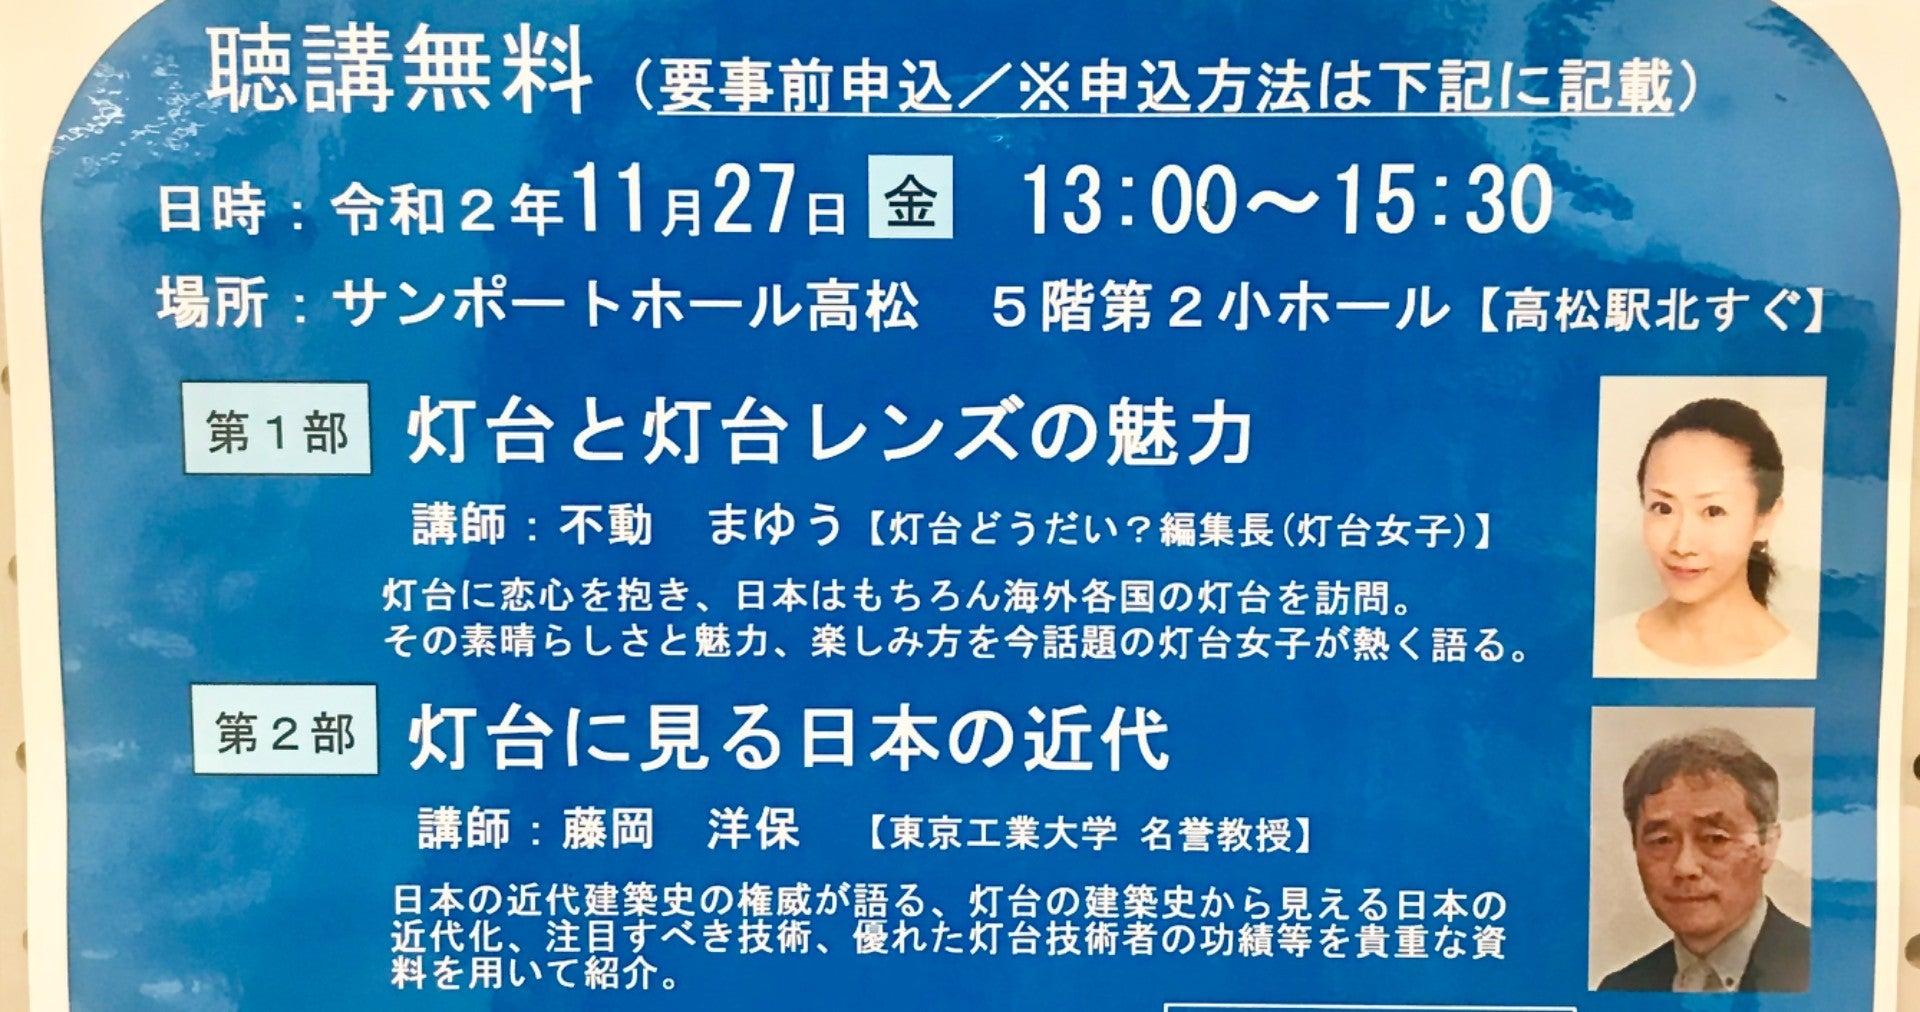 高松市の男木島灯台点灯125周年記念 特別講演会! 灯台女子 不動まゆう ...